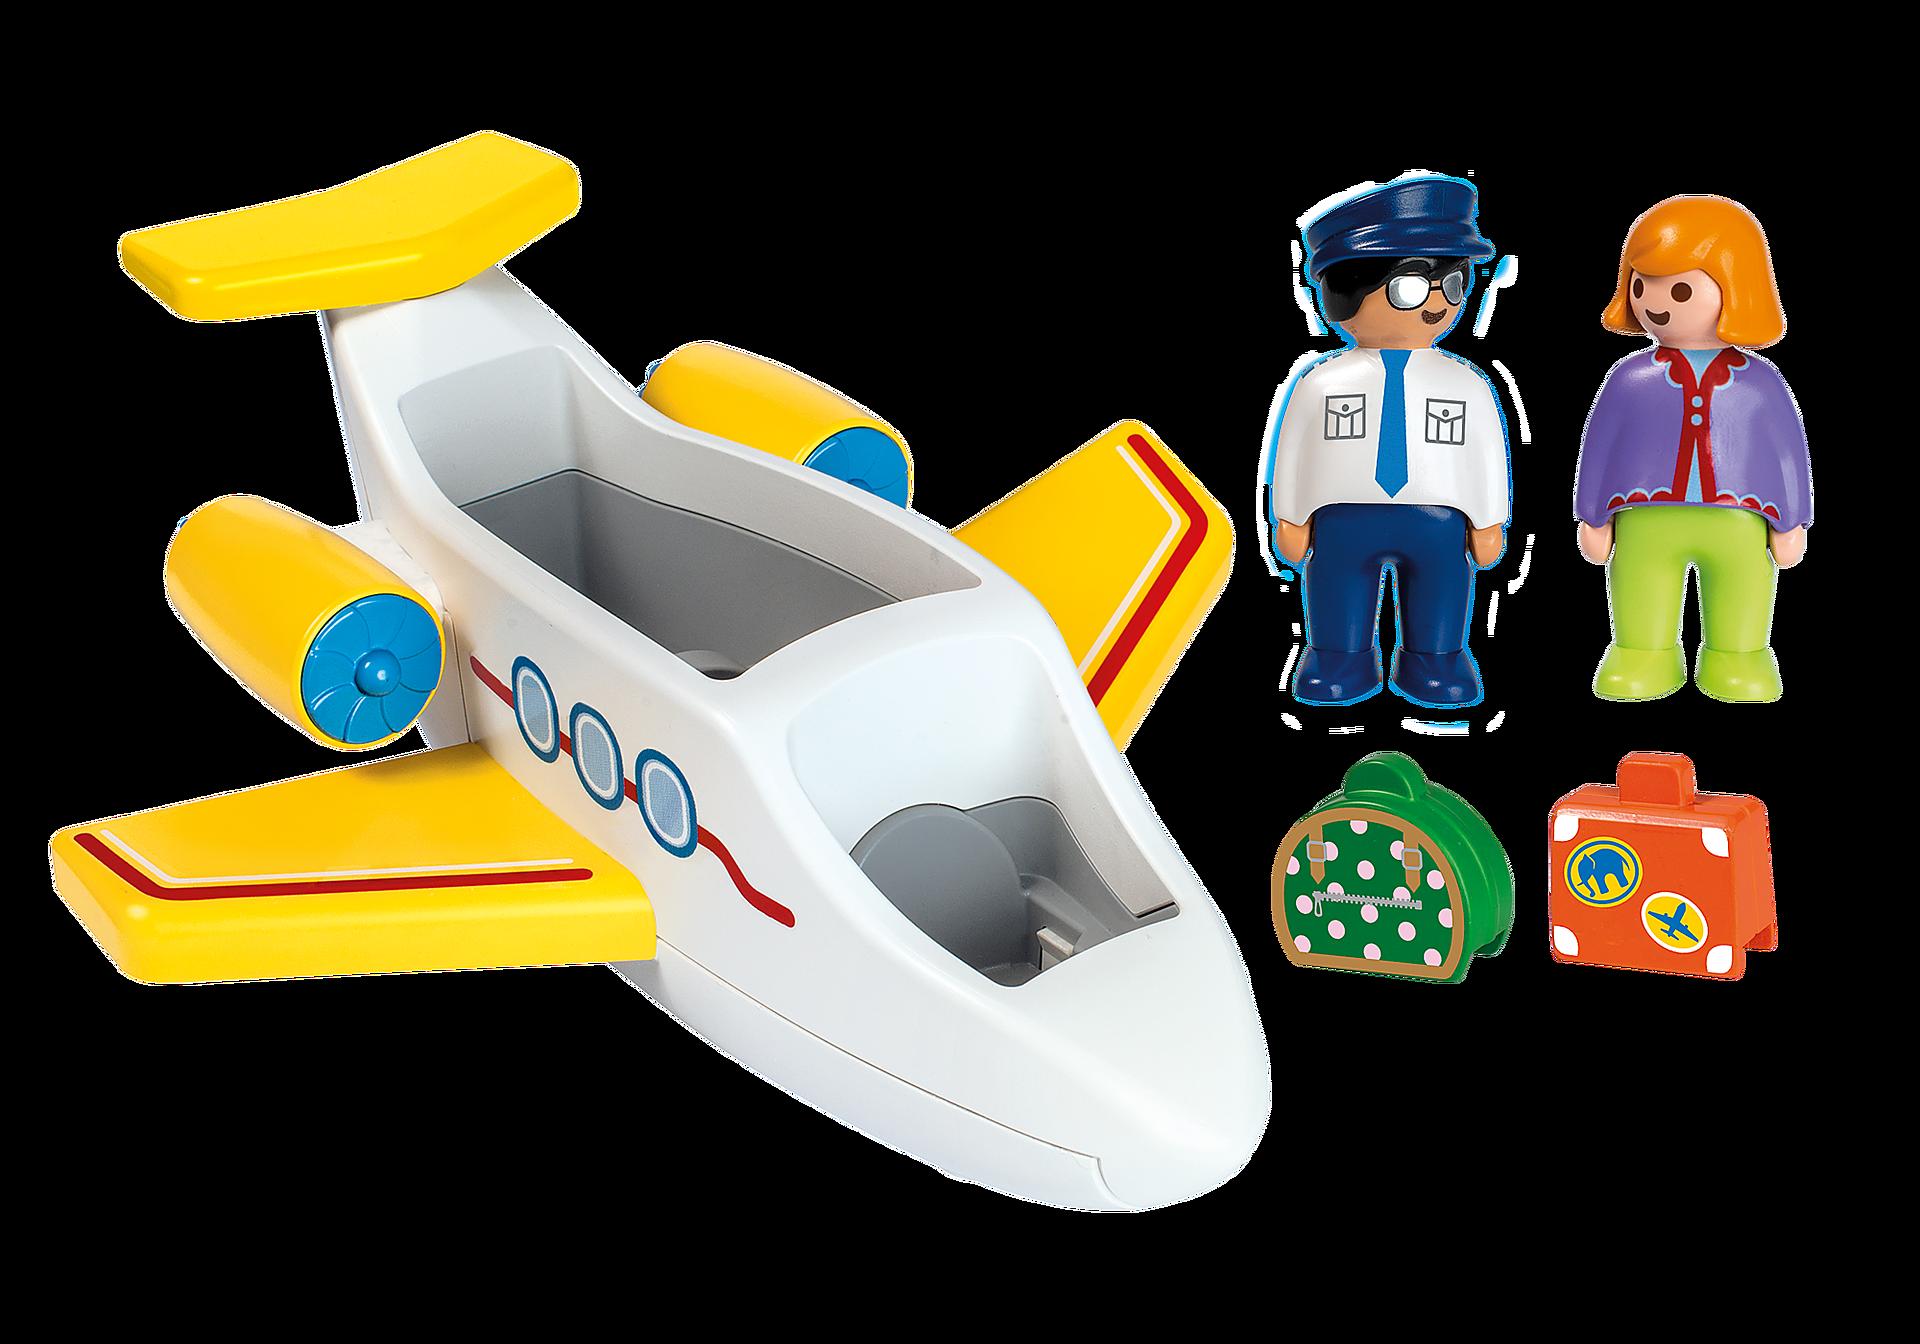 70185 Samolot pasażerski zoom image3